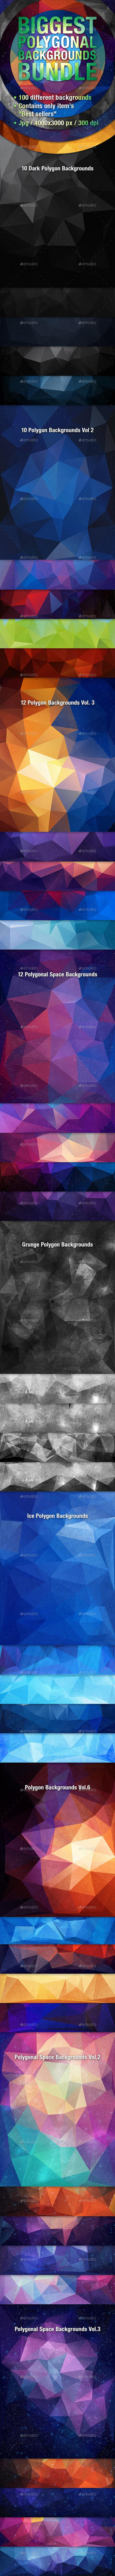 100 Polygon Backgrounds Bundle Vol.4